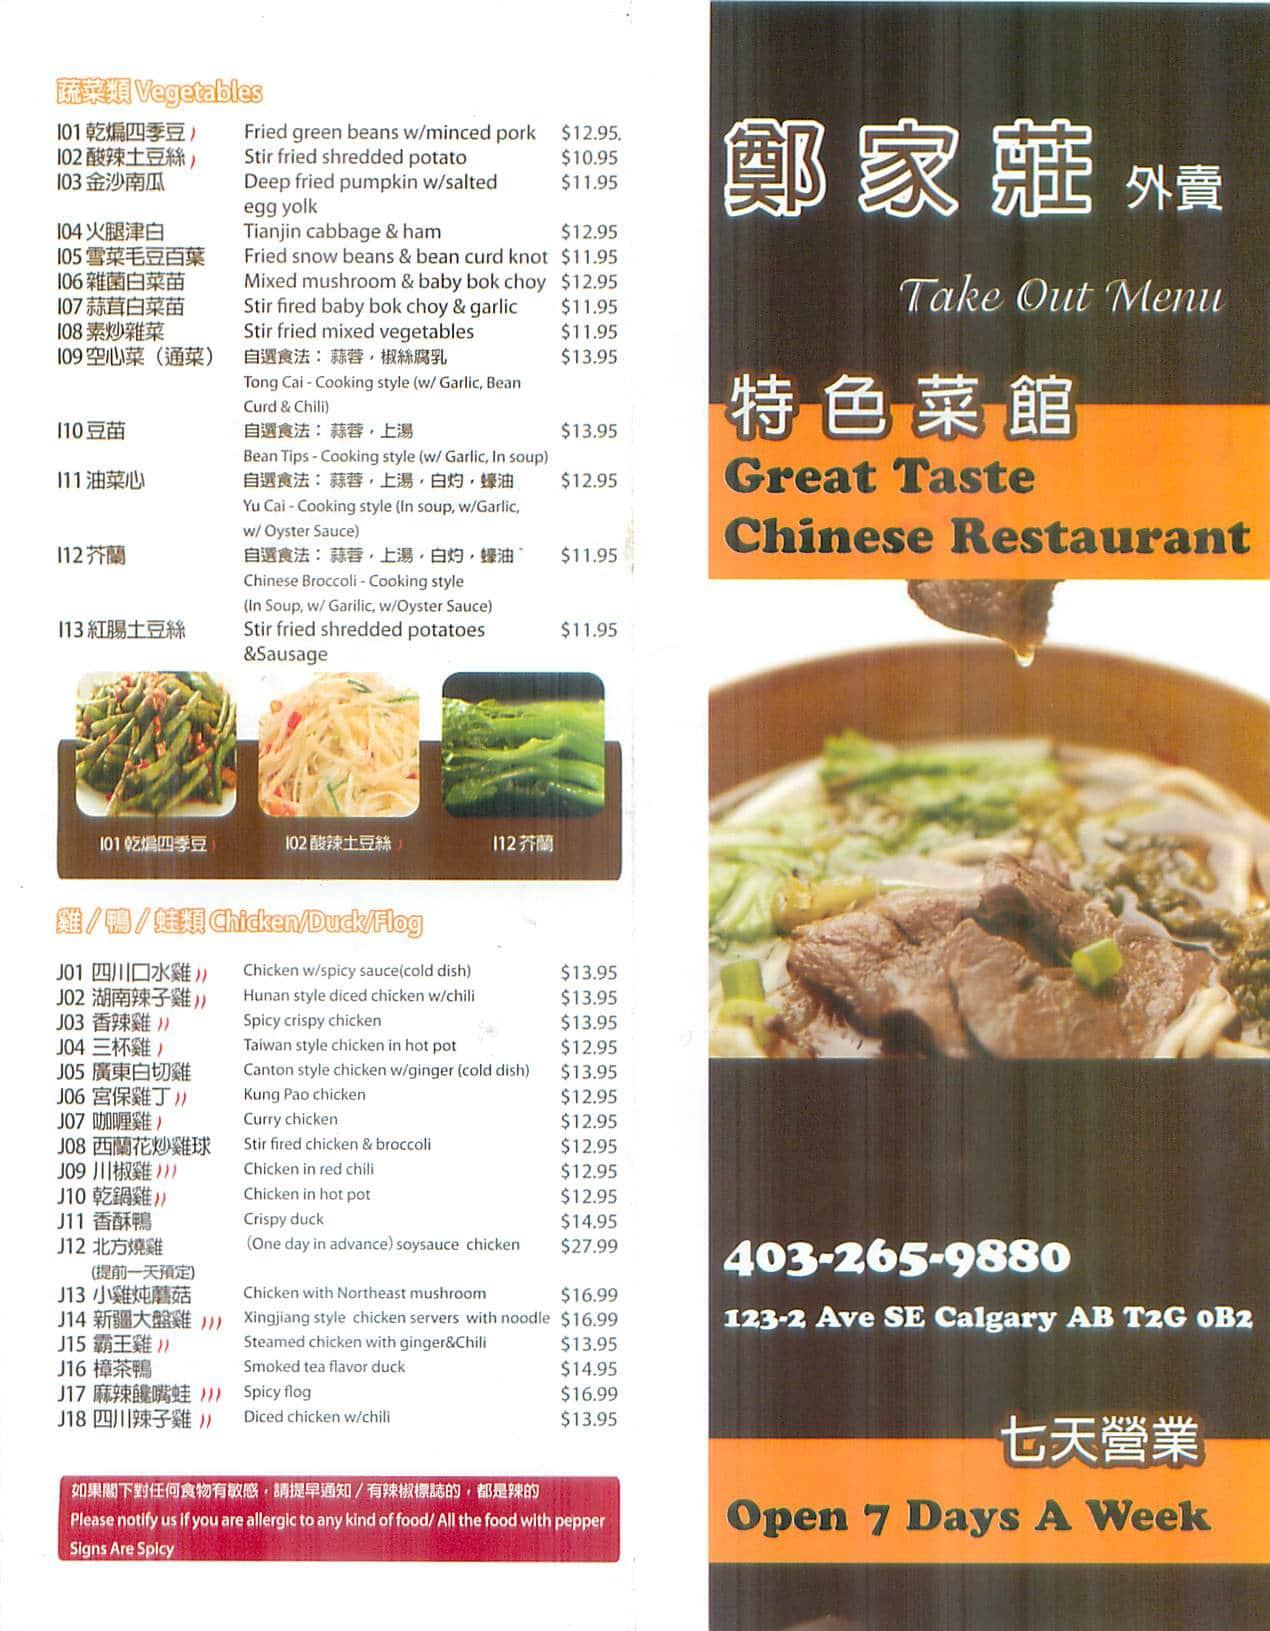 great taste chinese restaurant menu  urbanspoon/zomato